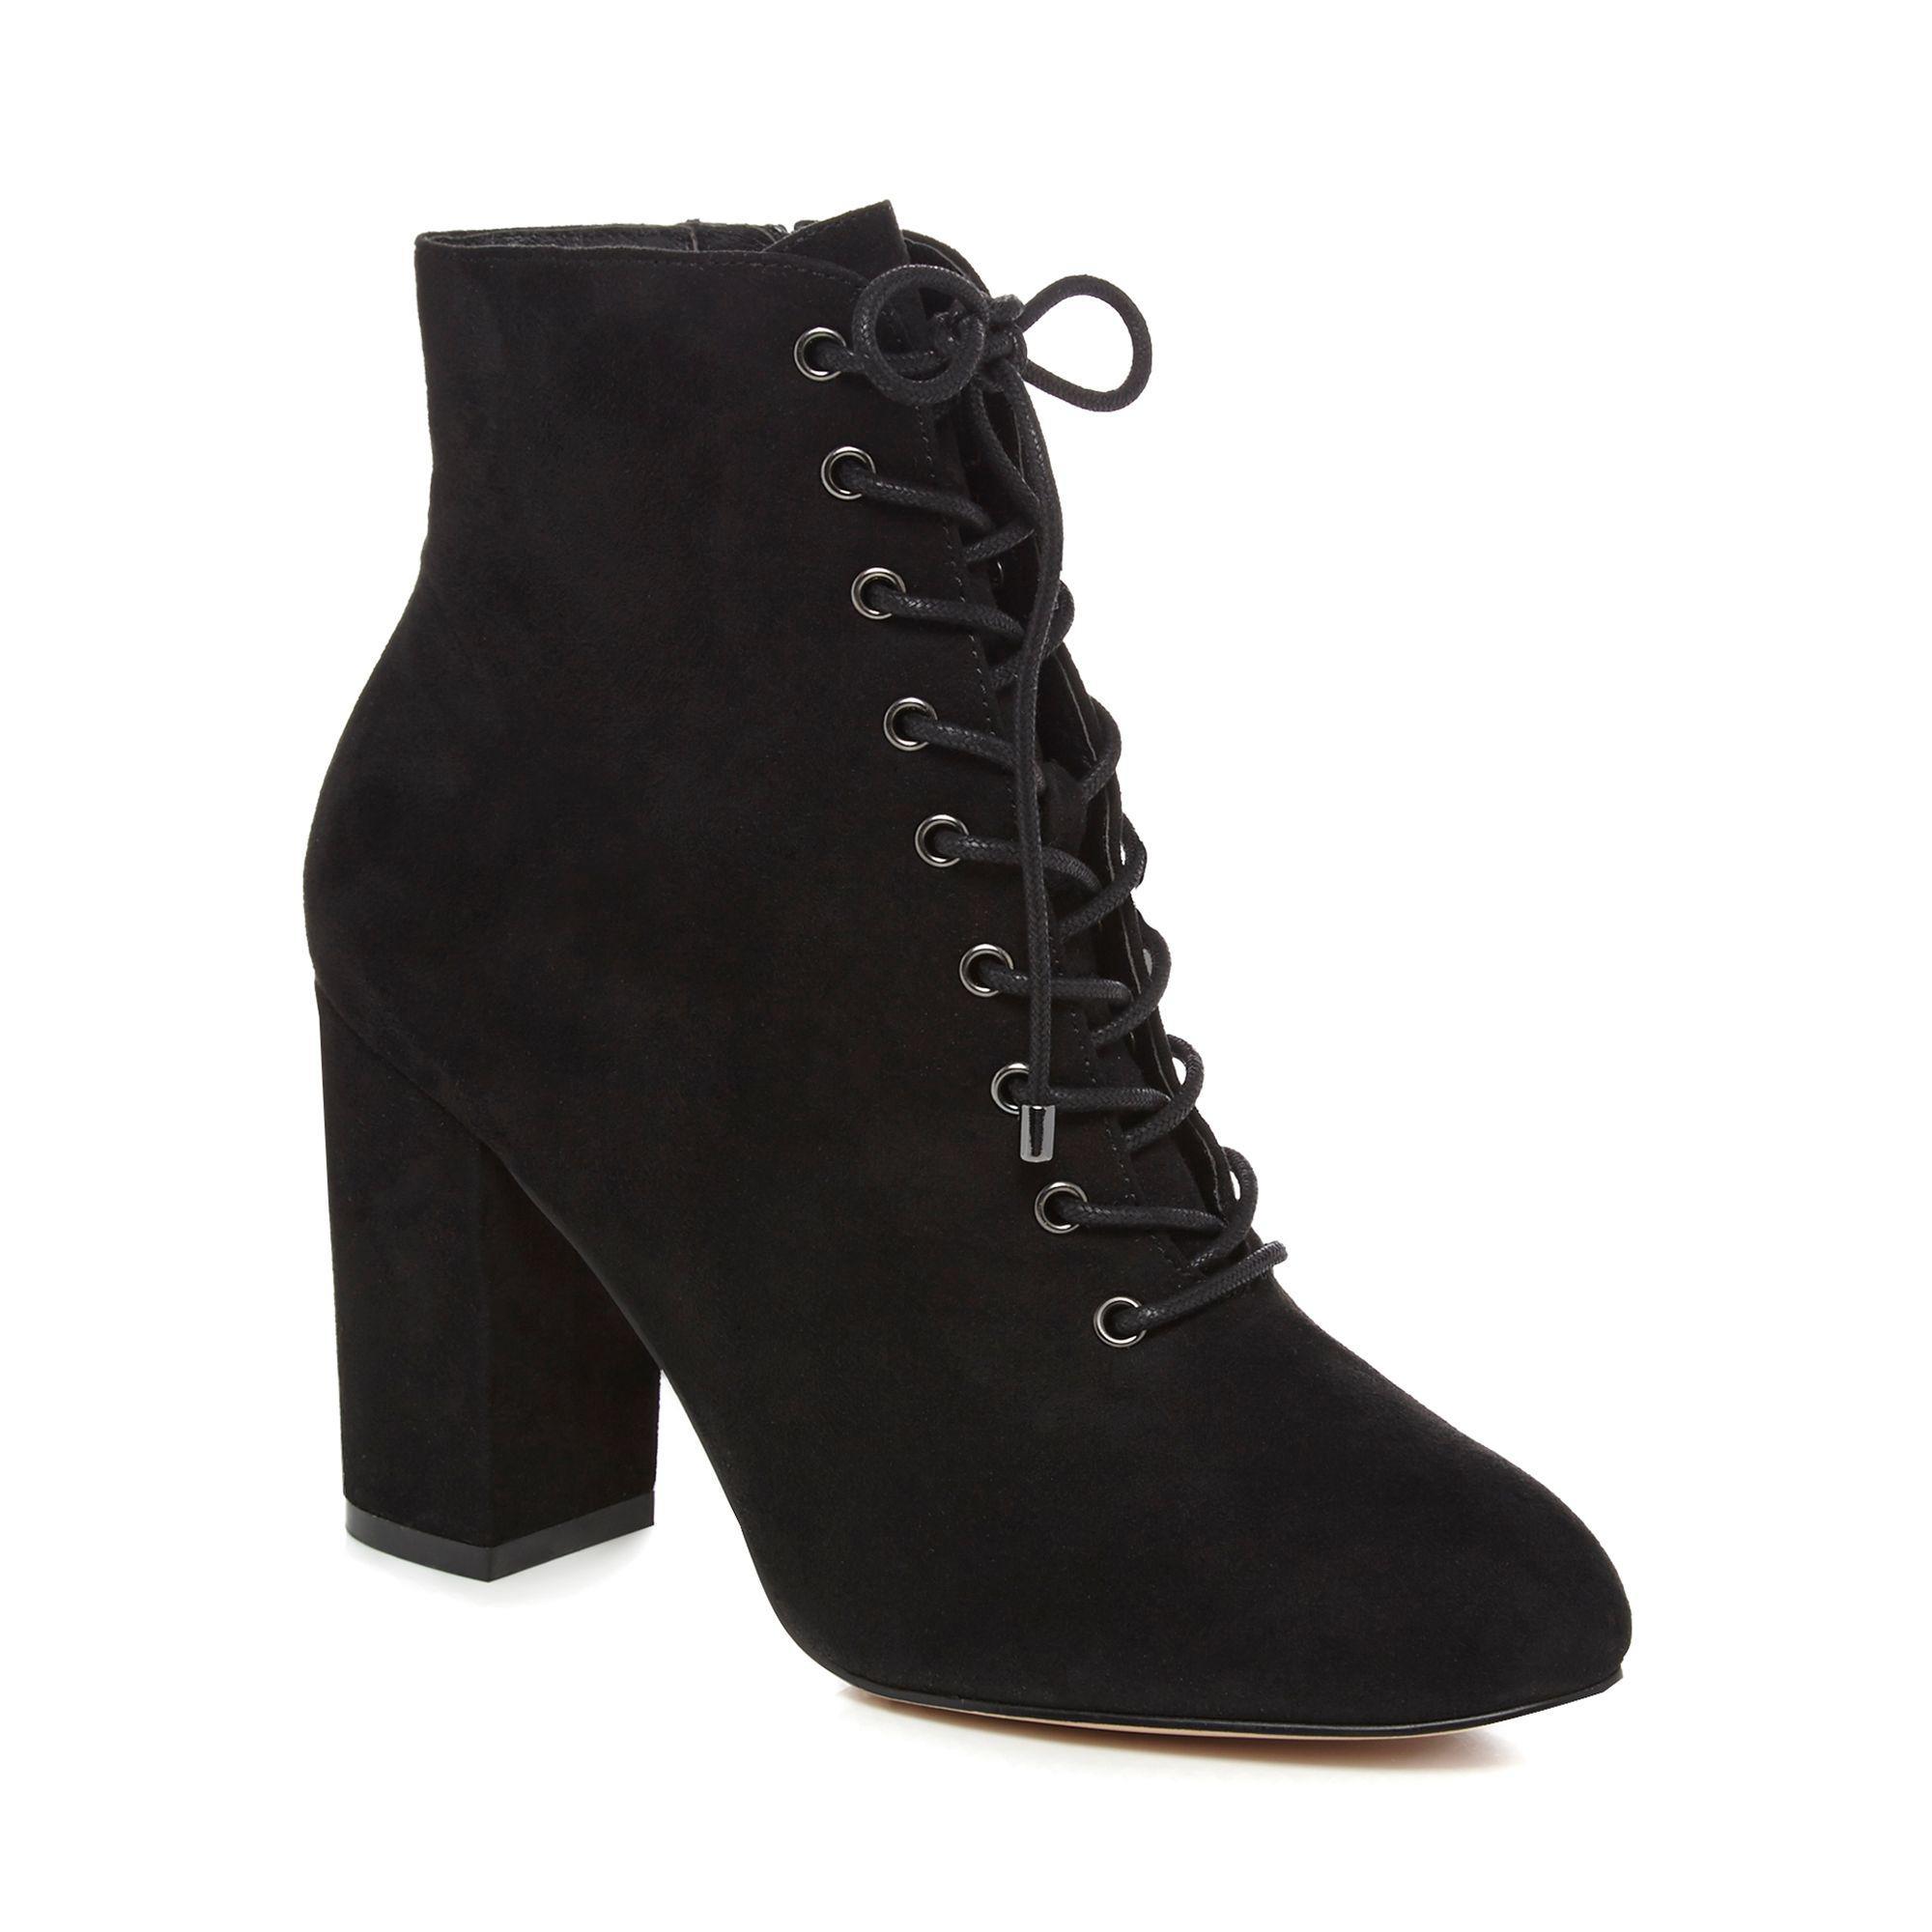 Faith Black Suedette 'barb' High Block Heel Ankle Boots